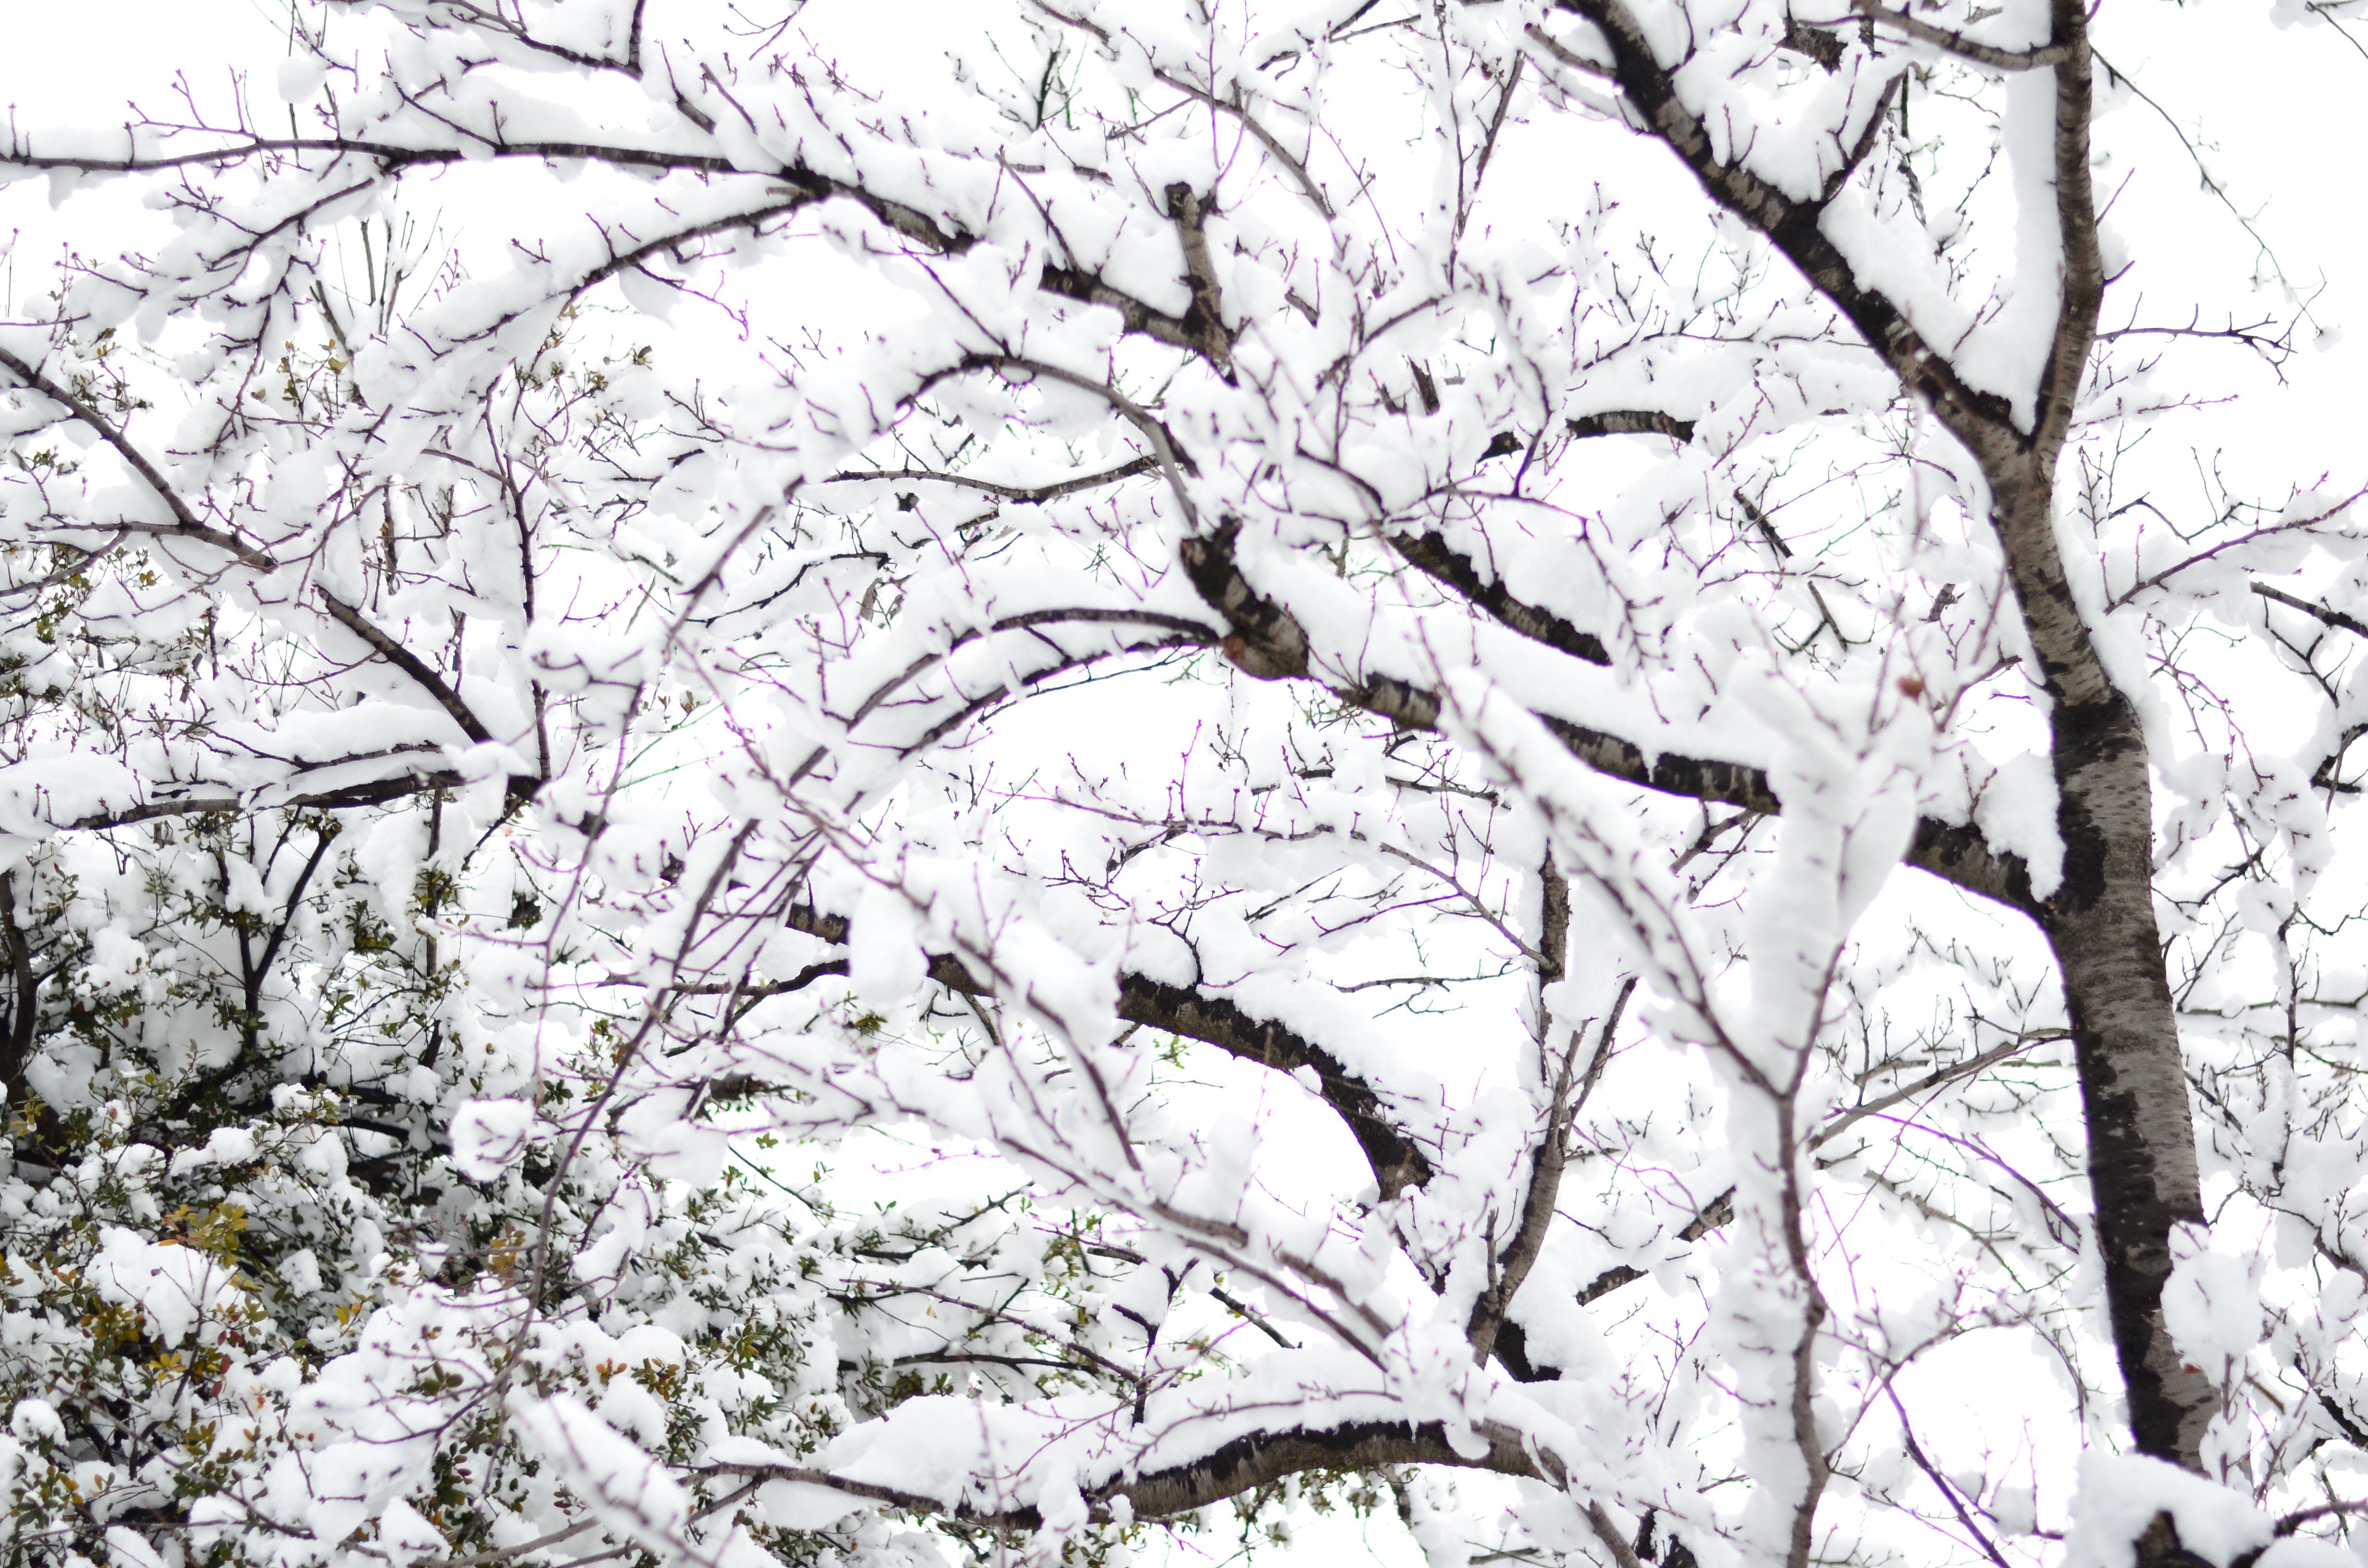 Cherry Blossom Tree In Winter Blossom Trees Cherry Blossom Tree Winter Trees